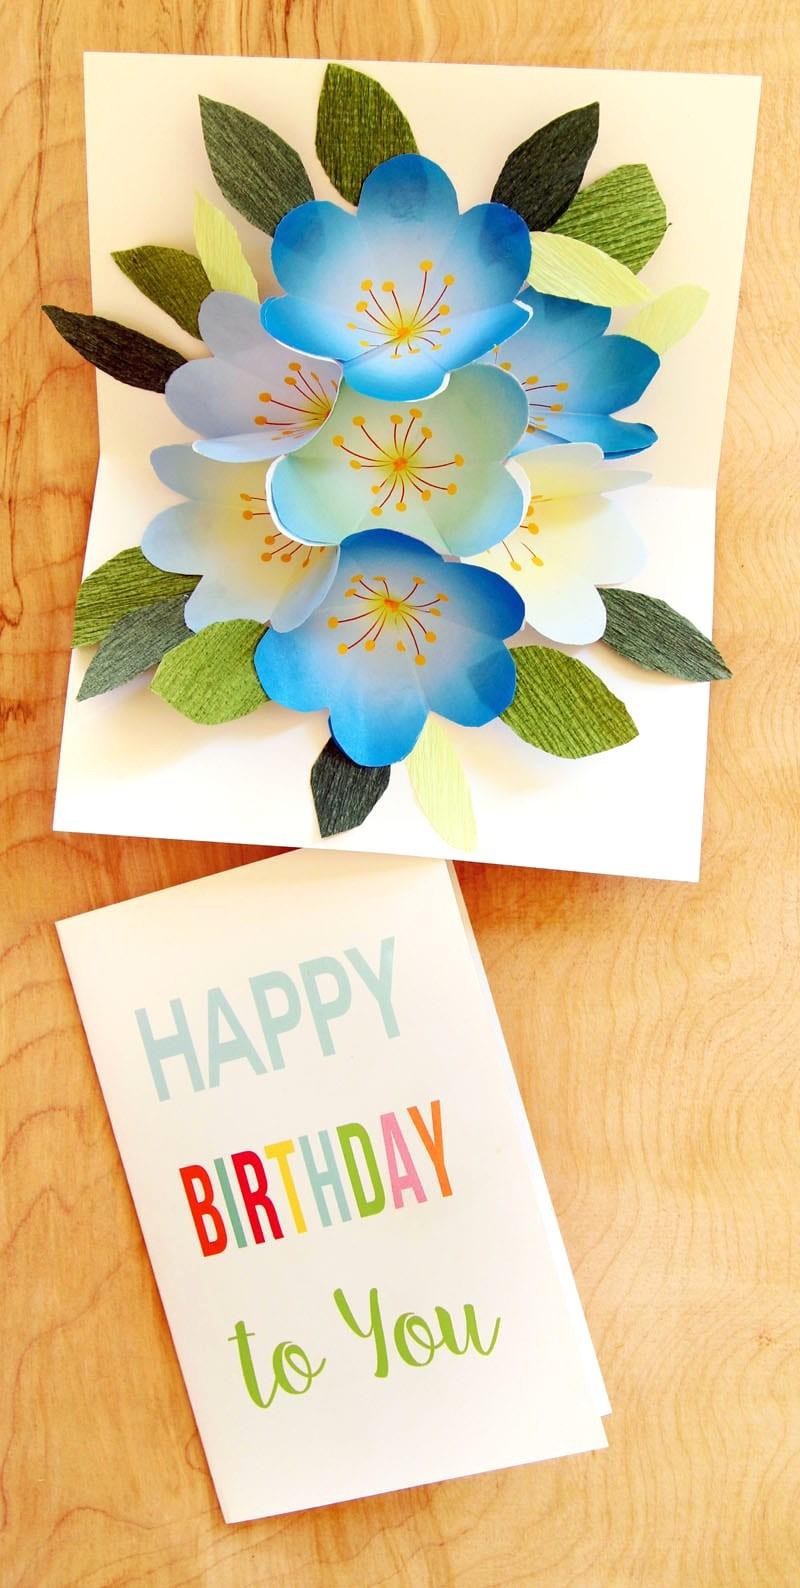 Easy Diy Free Printable Happy Birthday Card Greeting Pop Up Bouquet - Free Printable Happy Birthday Cards For Dad